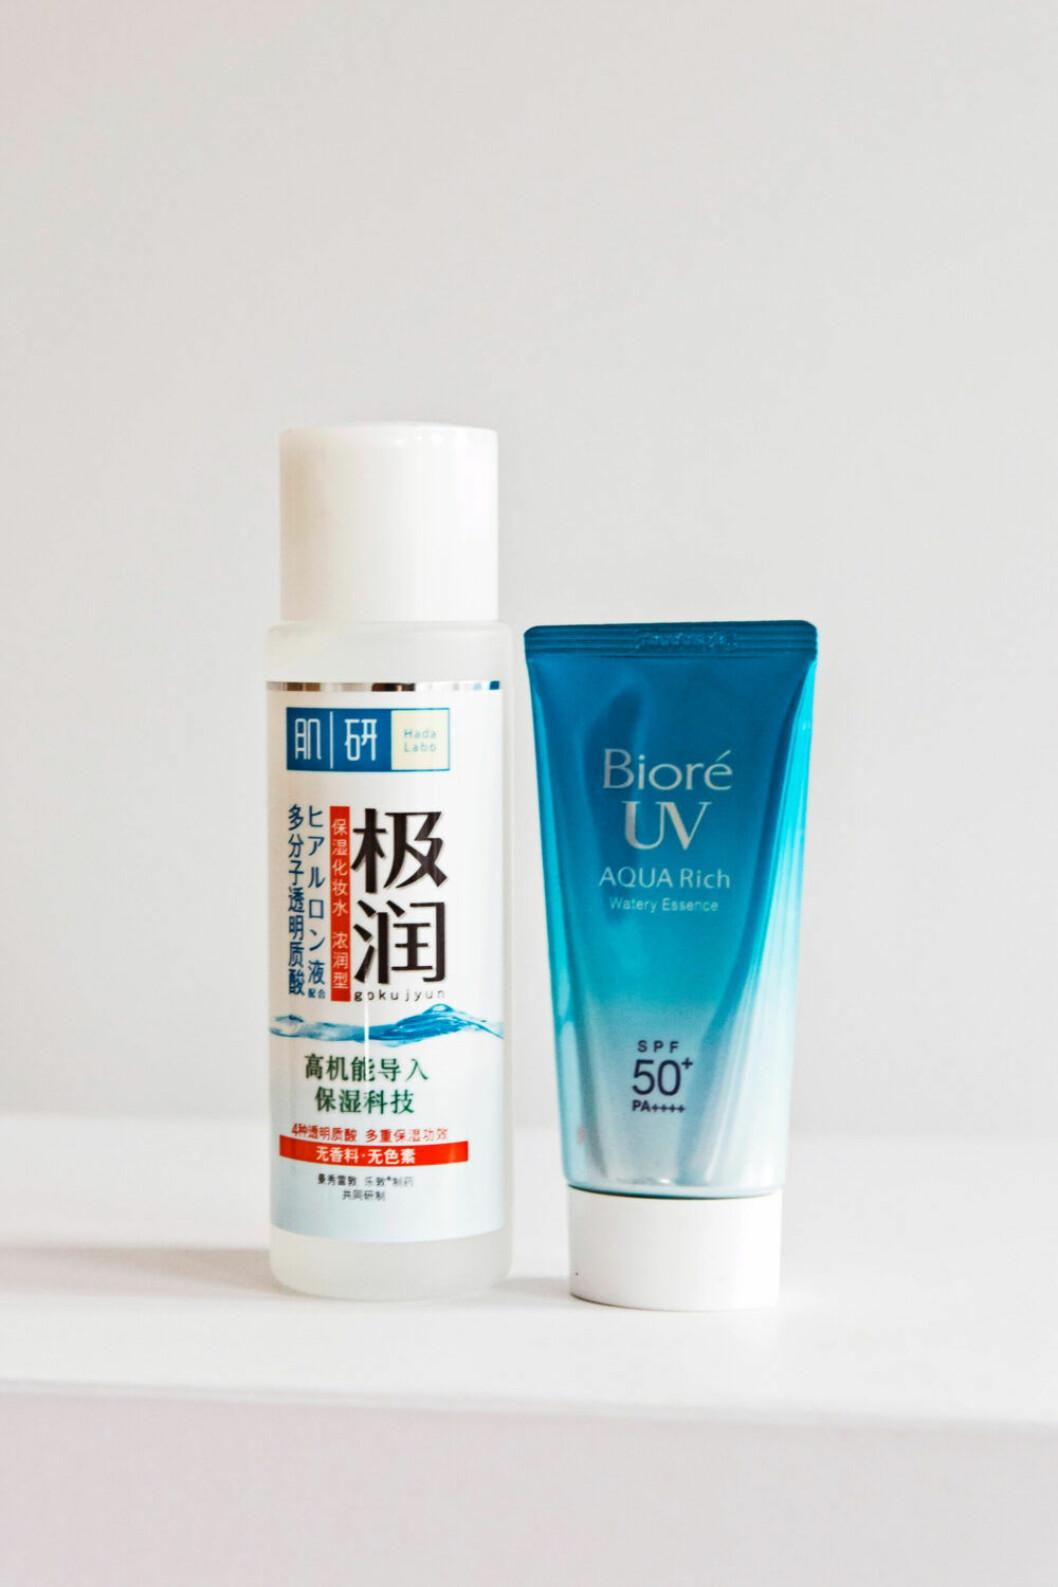 Produkterna Bioré UVaquarich och Hada Labo Hyaluronic Acid lotion